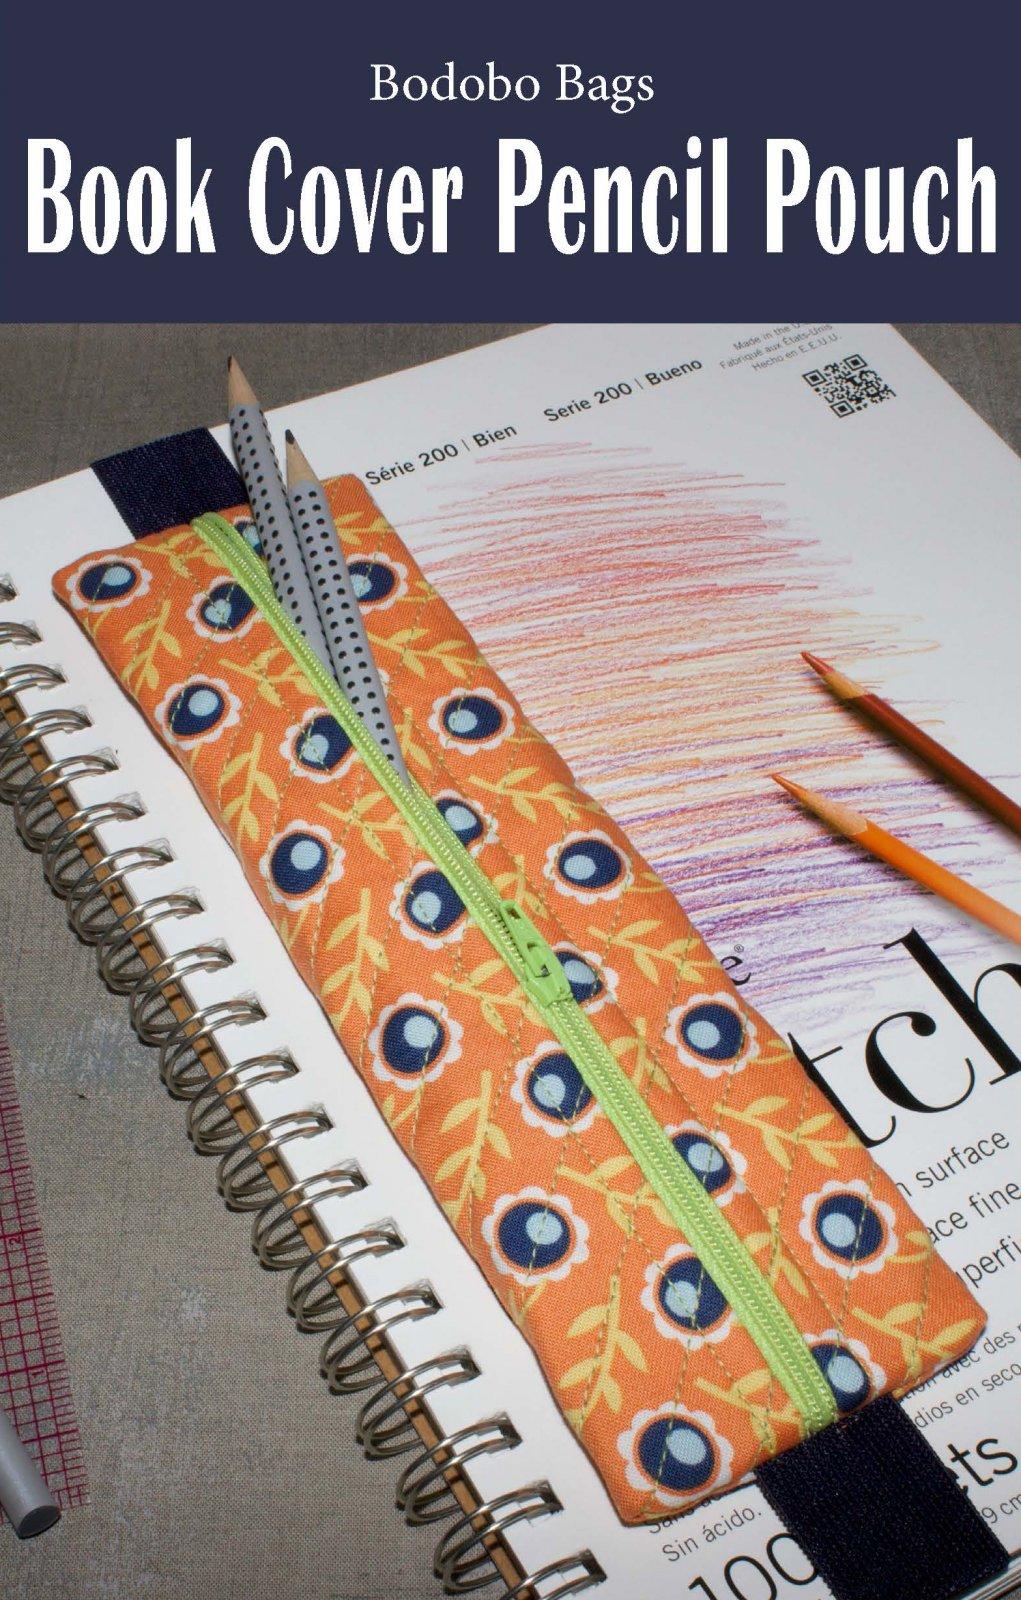 Book Cover Pencil Pouch